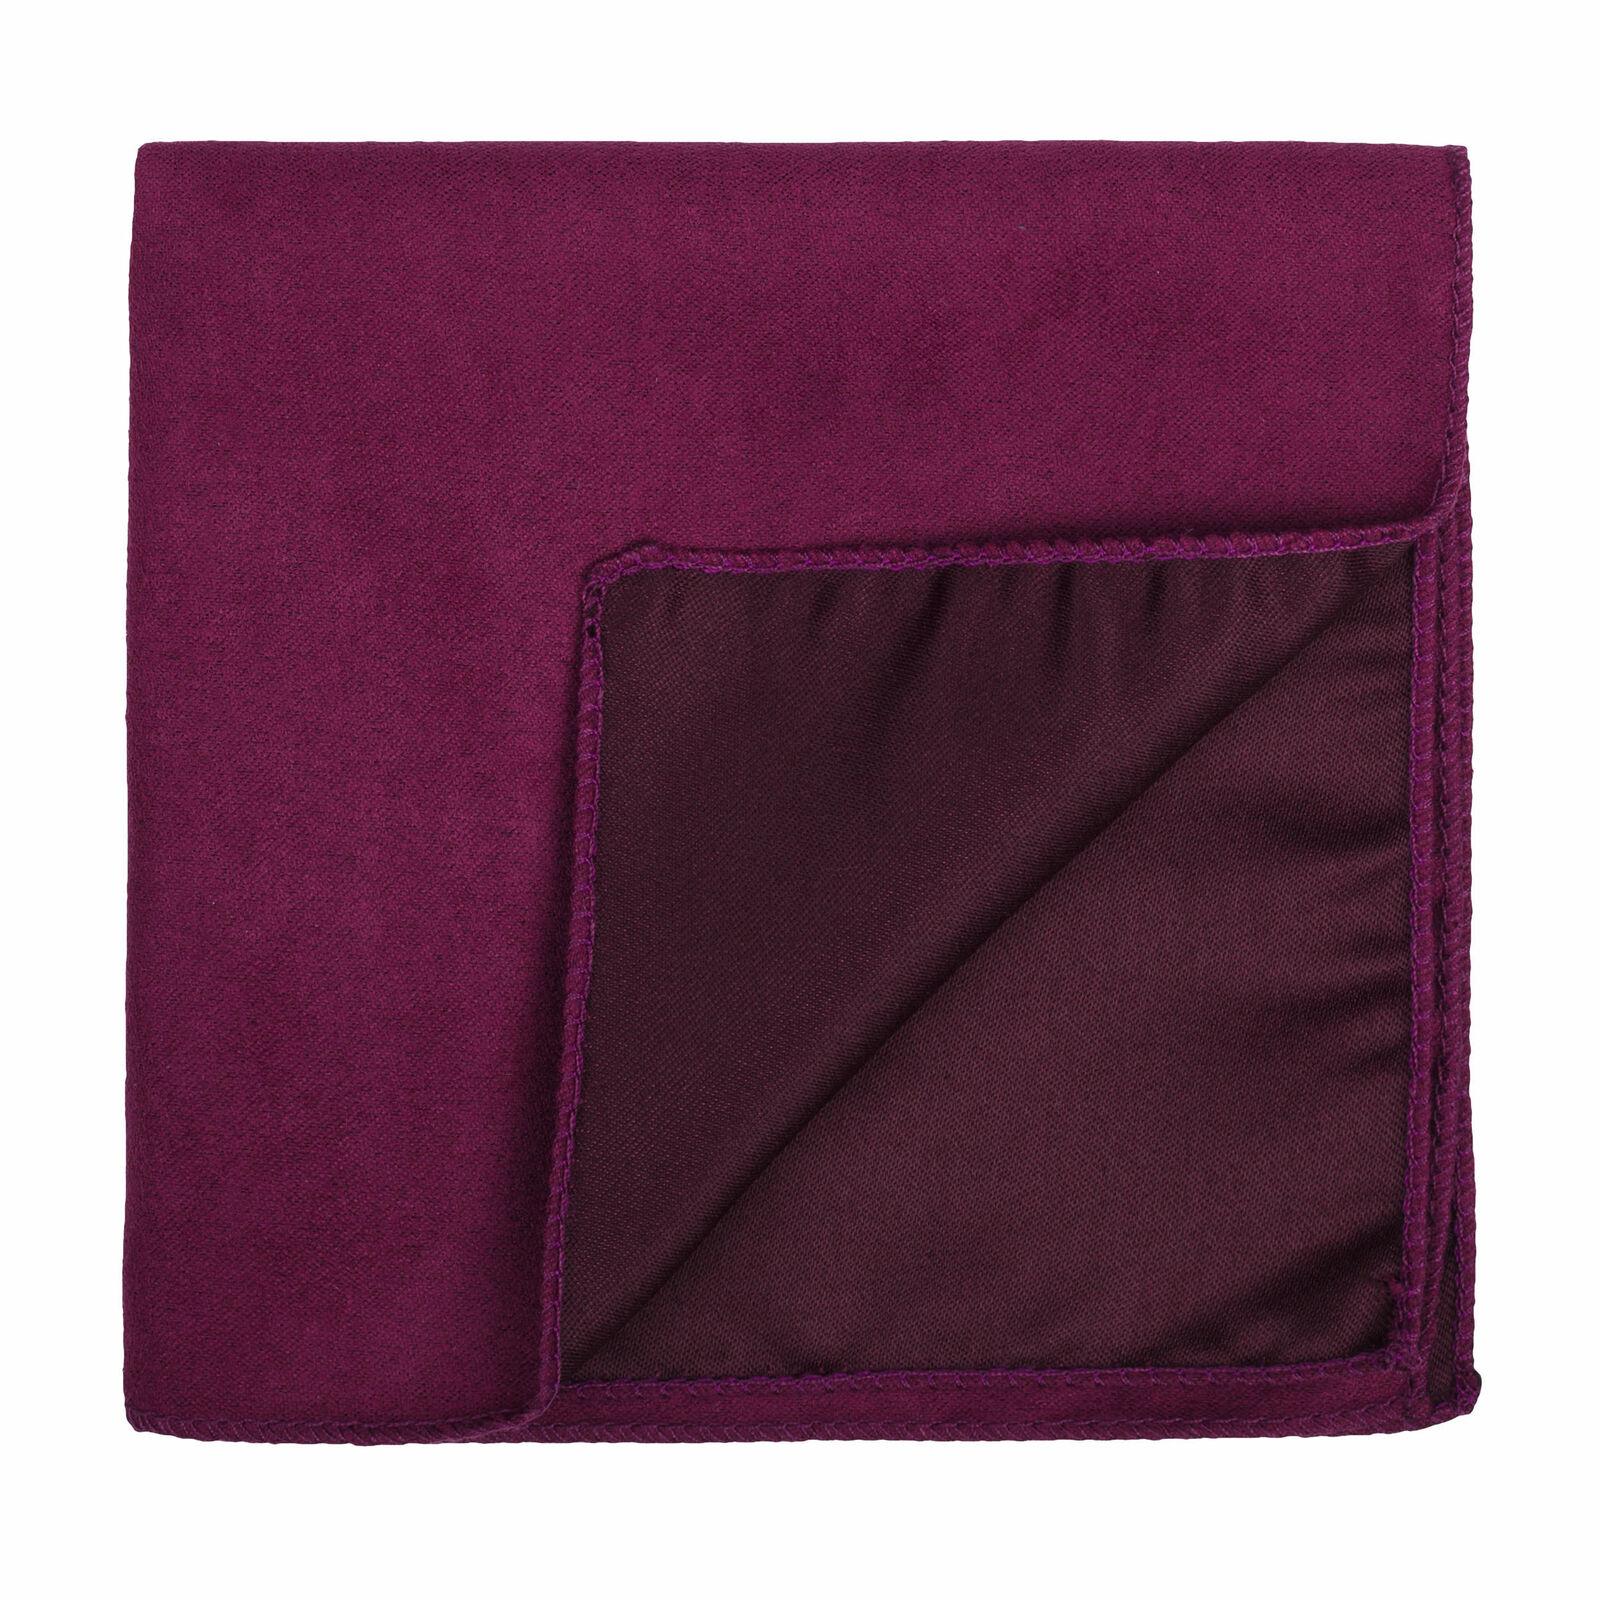 UK Red Velvet Suede Pocket Square Plain Wedding Handkerchief Multiple Colours